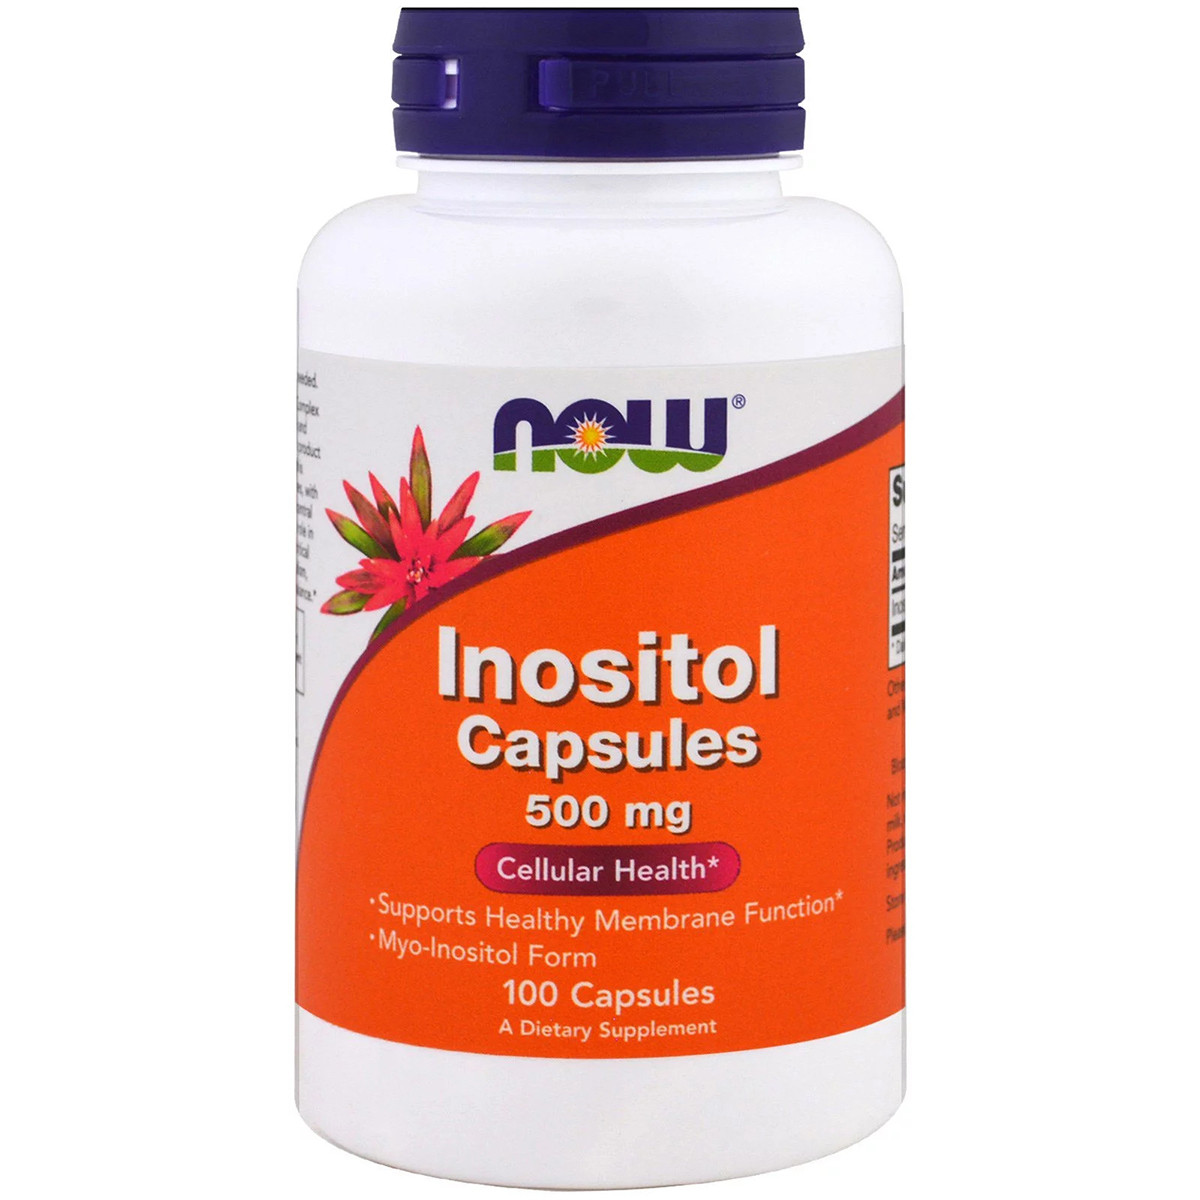 Инозитол (В8), Inositol, Now Foods, 500 мг, 100 вегетарианских капсул